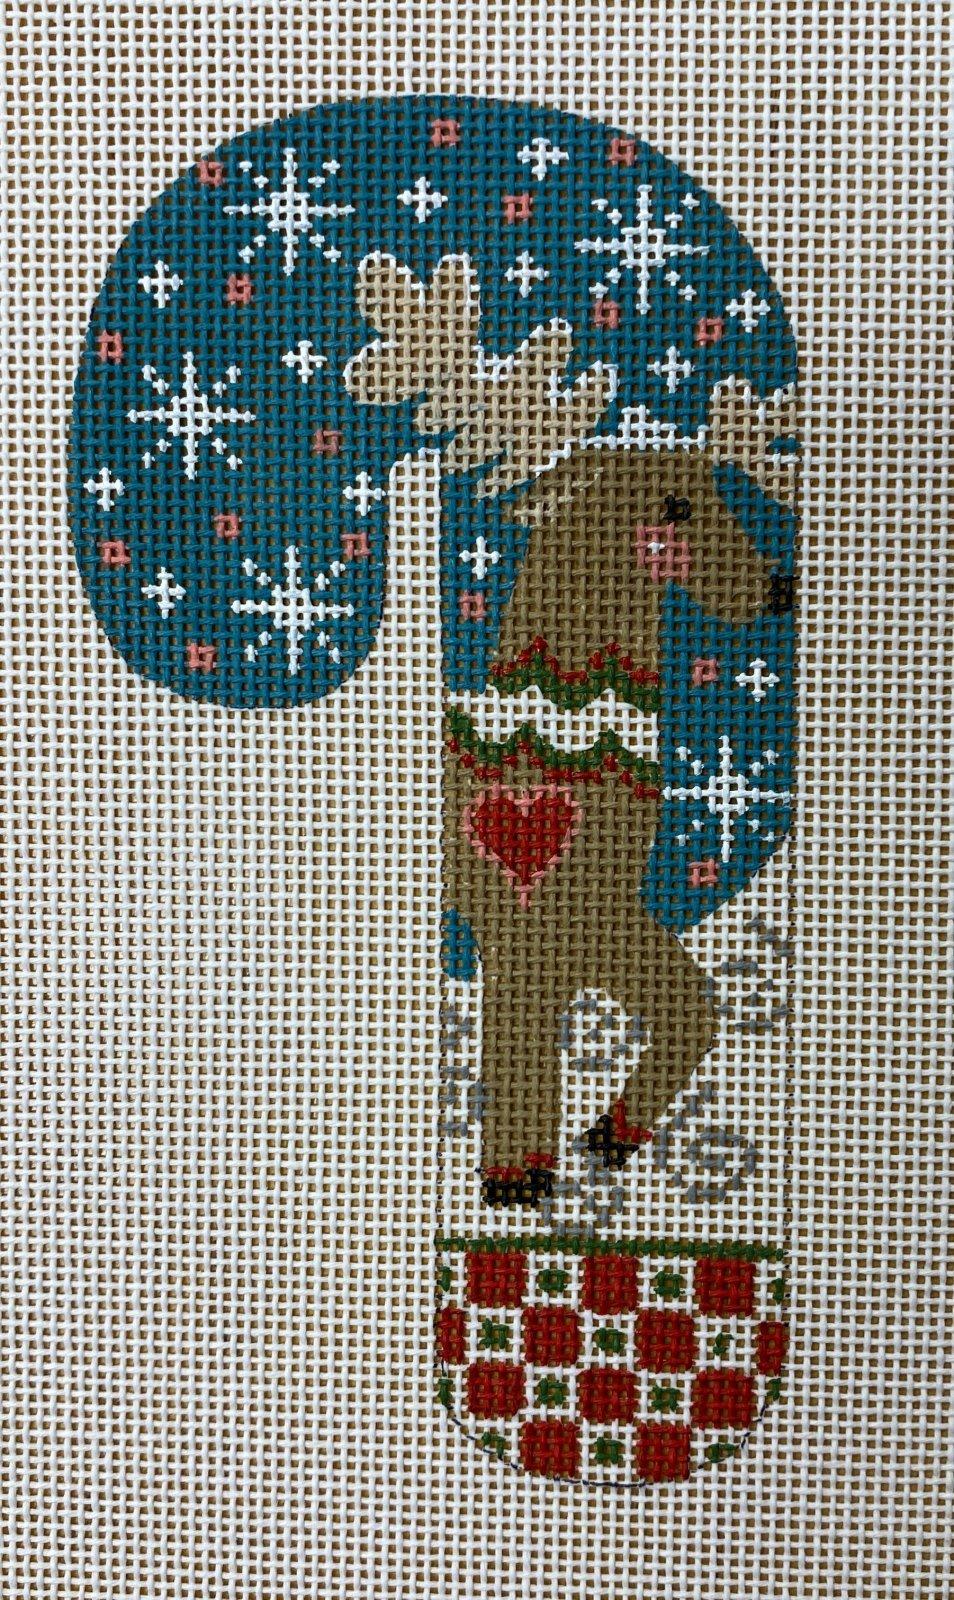 reindeer w heart candy cane